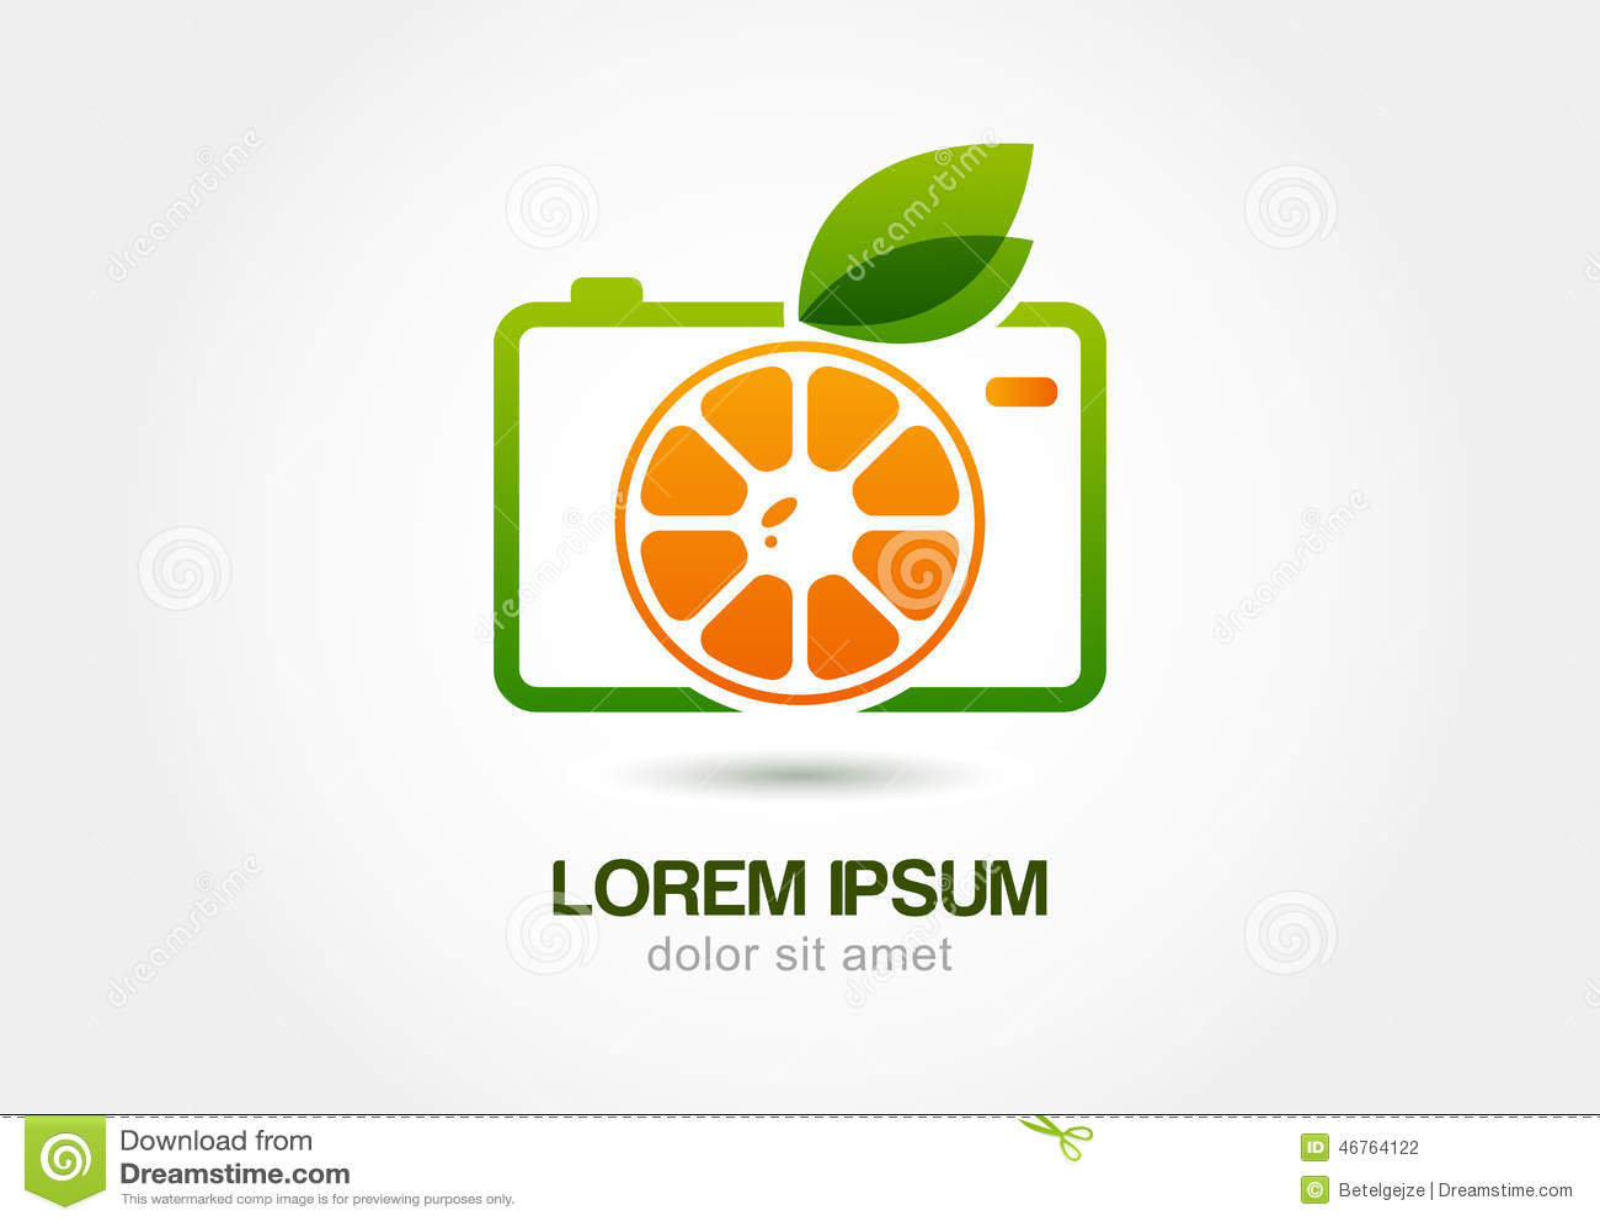 the gallery for gt orange fruit logo quiz